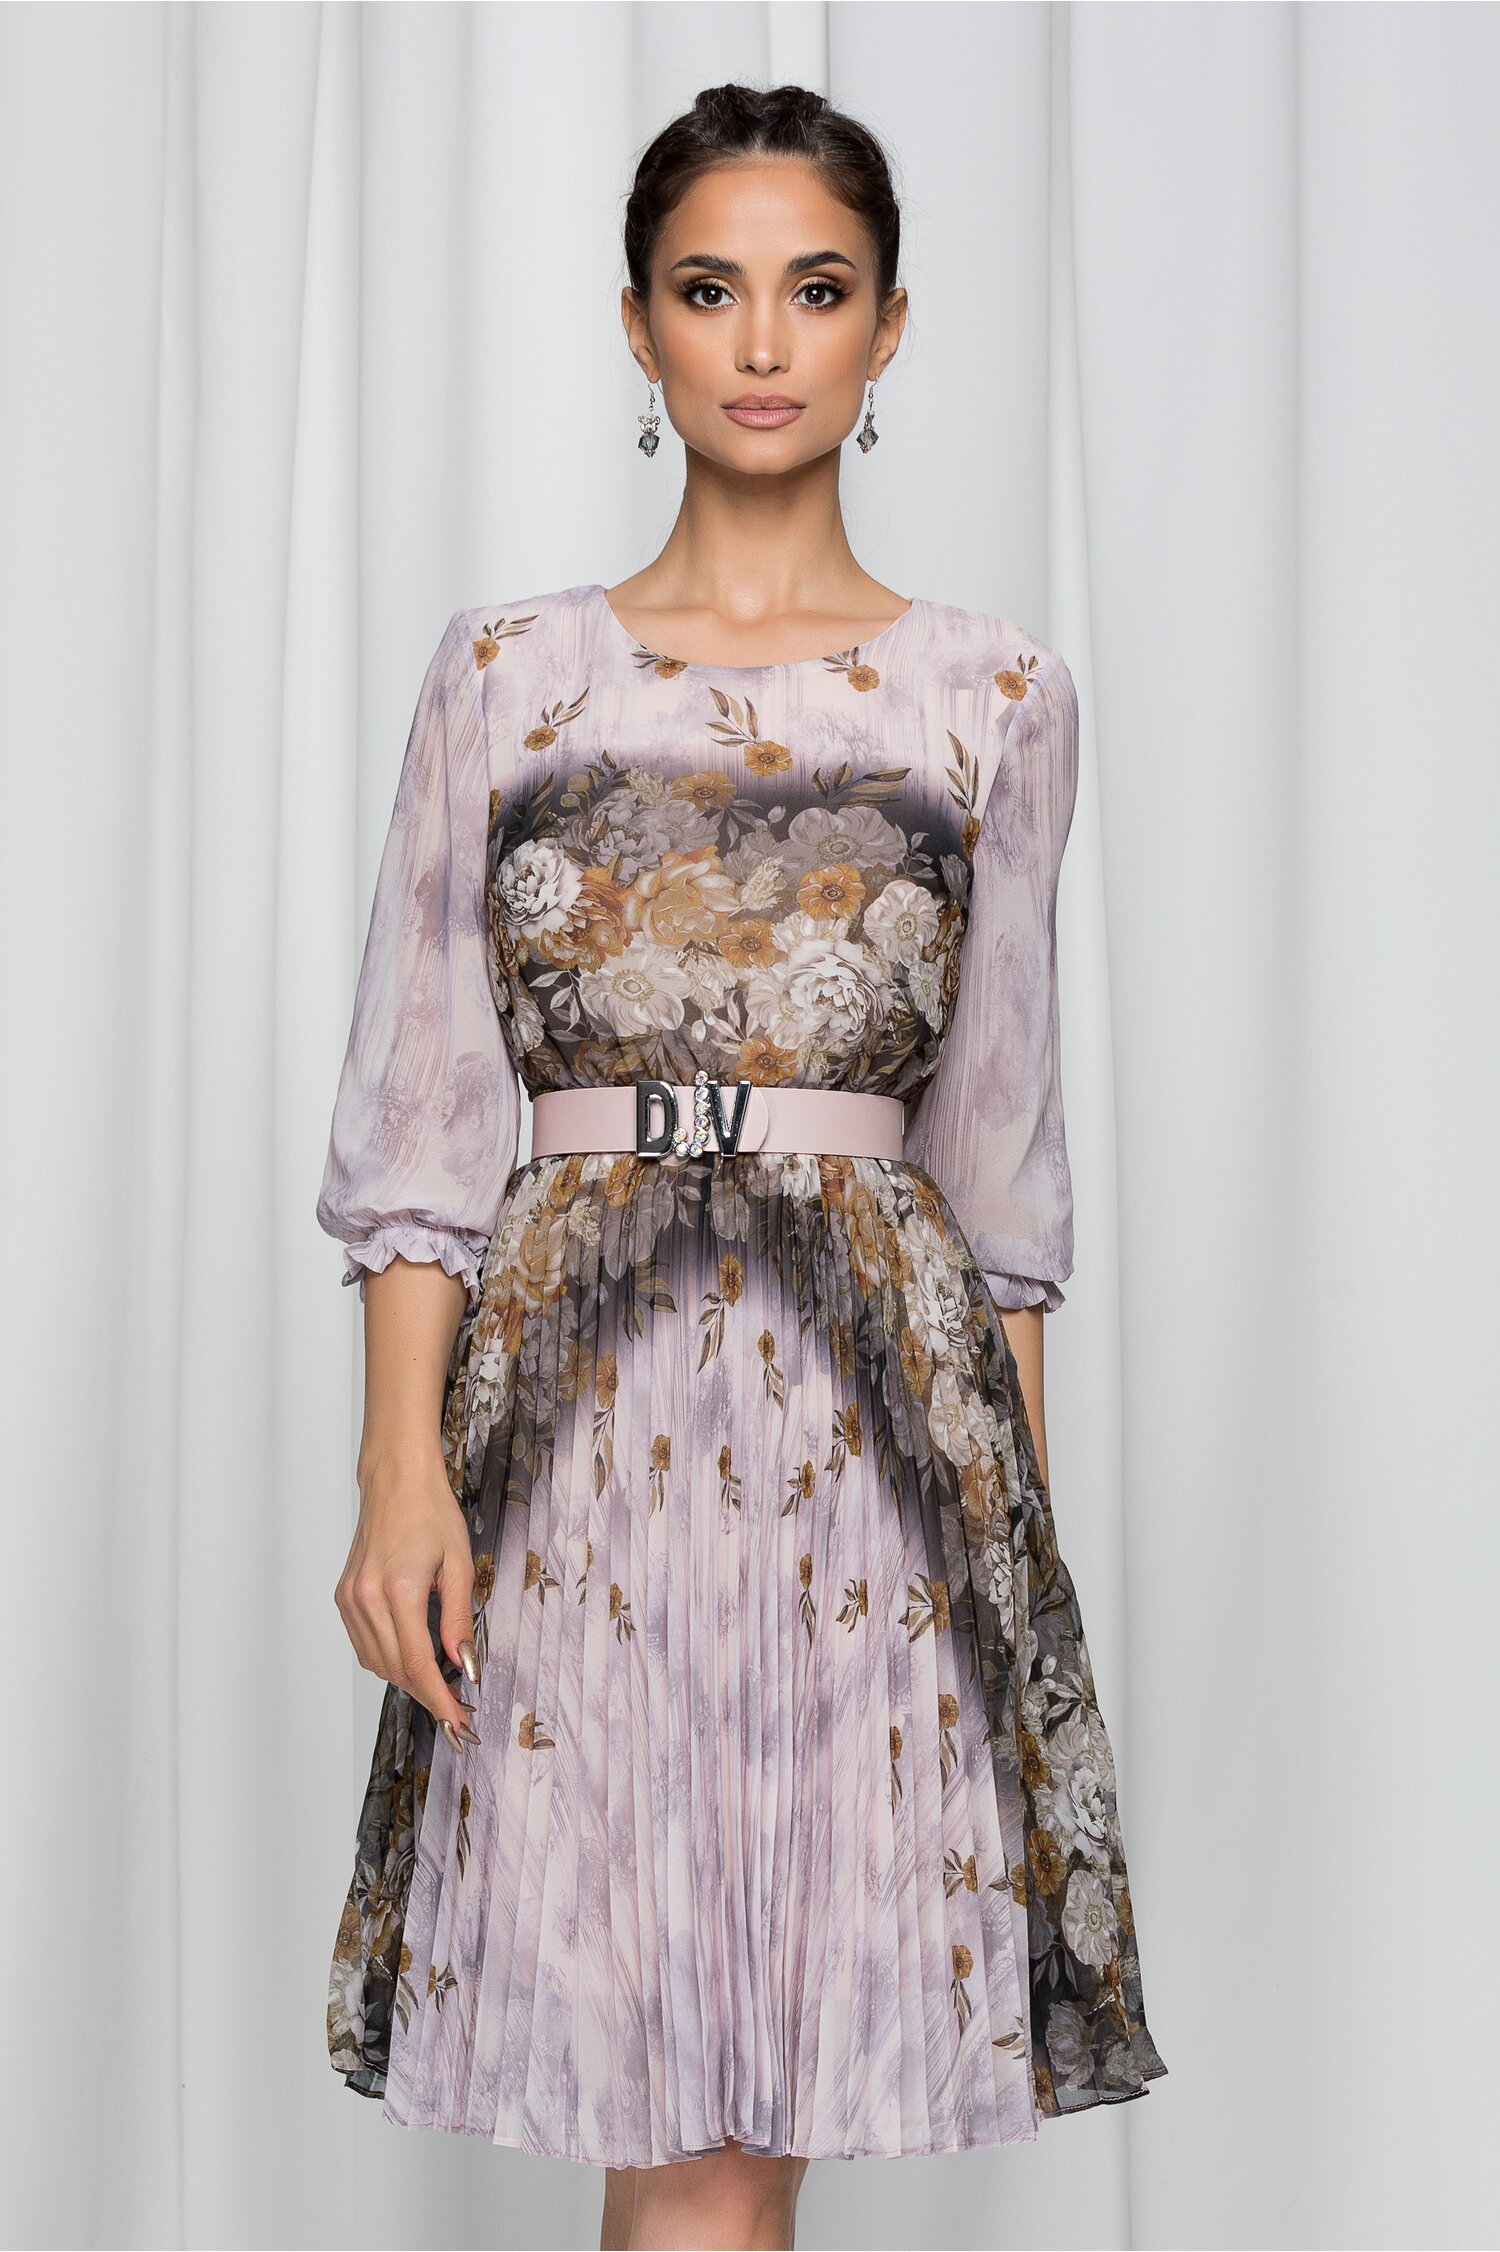 Rochie Jolanda bej cu imprimeu floral si pliuri pe fusta